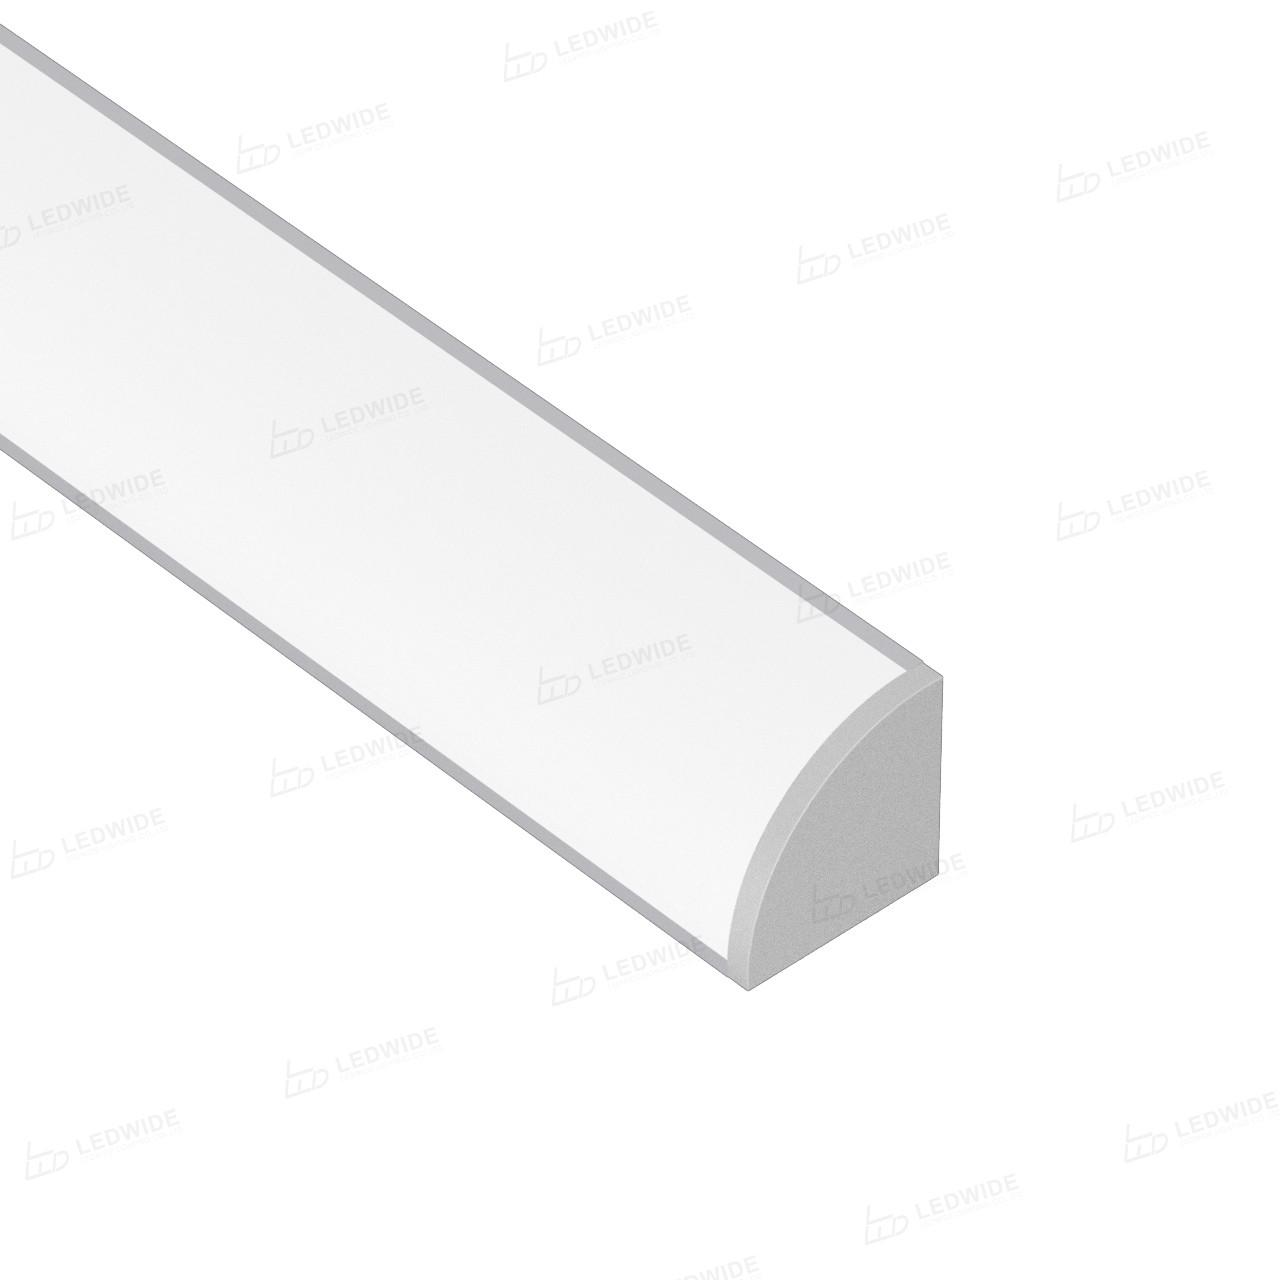 AC2 45˚ Corner Aluminium LED Profile for LED Strip 16x16mm Manufacturers, AC2 45˚ Corner Aluminium LED Profile for LED Strip 16x16mm Factory, Supply AC2 45˚ Corner Aluminium LED Profile for LED Strip 16x16mm